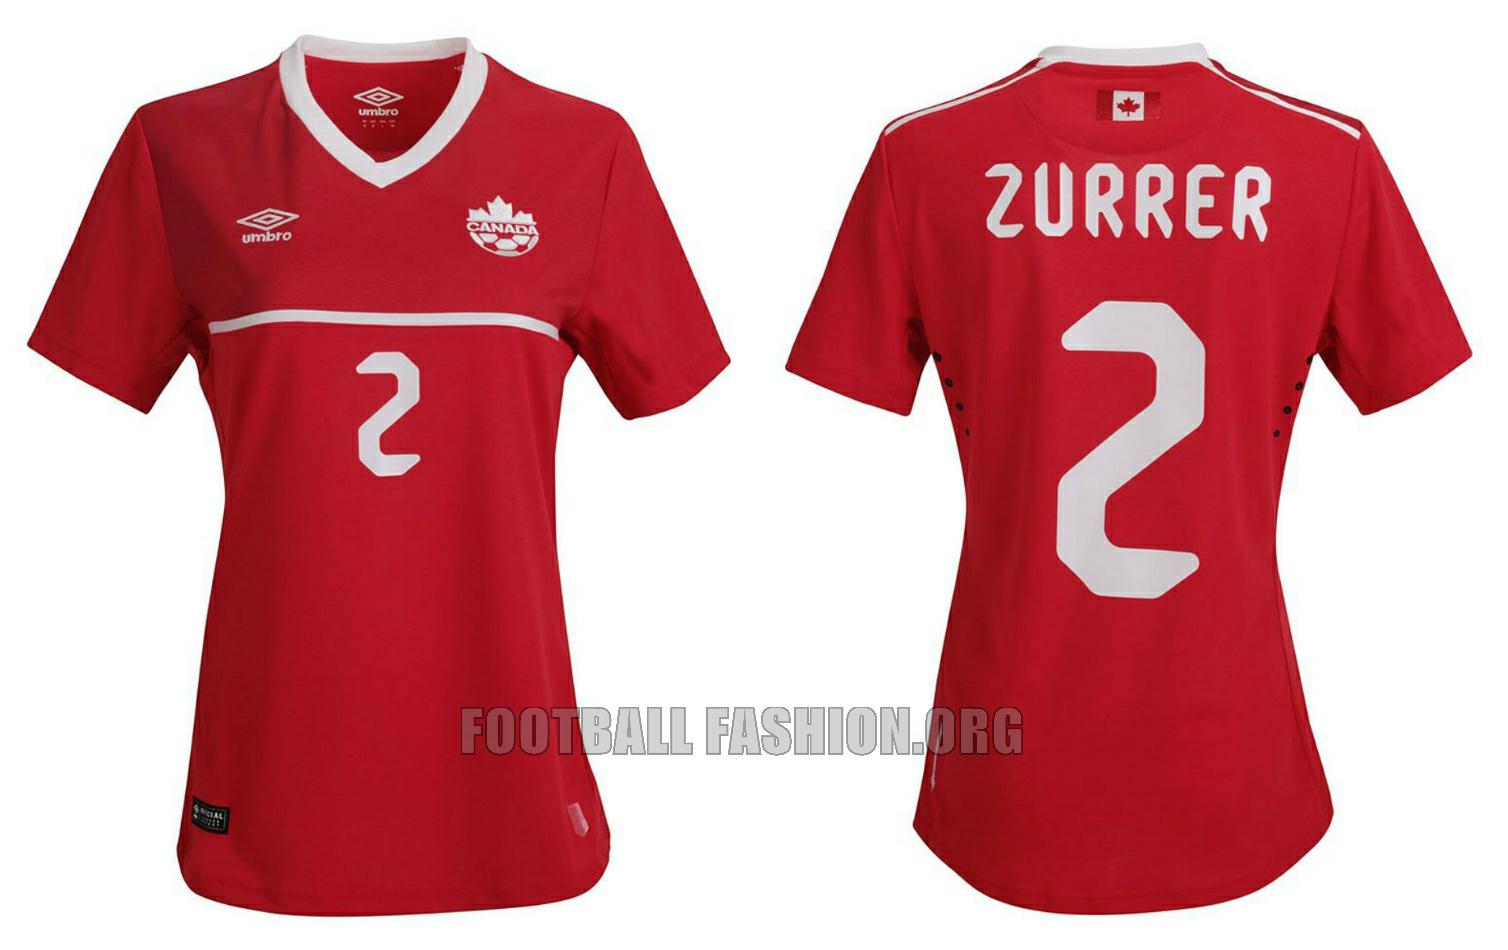 Canada Futbol 2015 The Canada 2015/16 Umbro Home